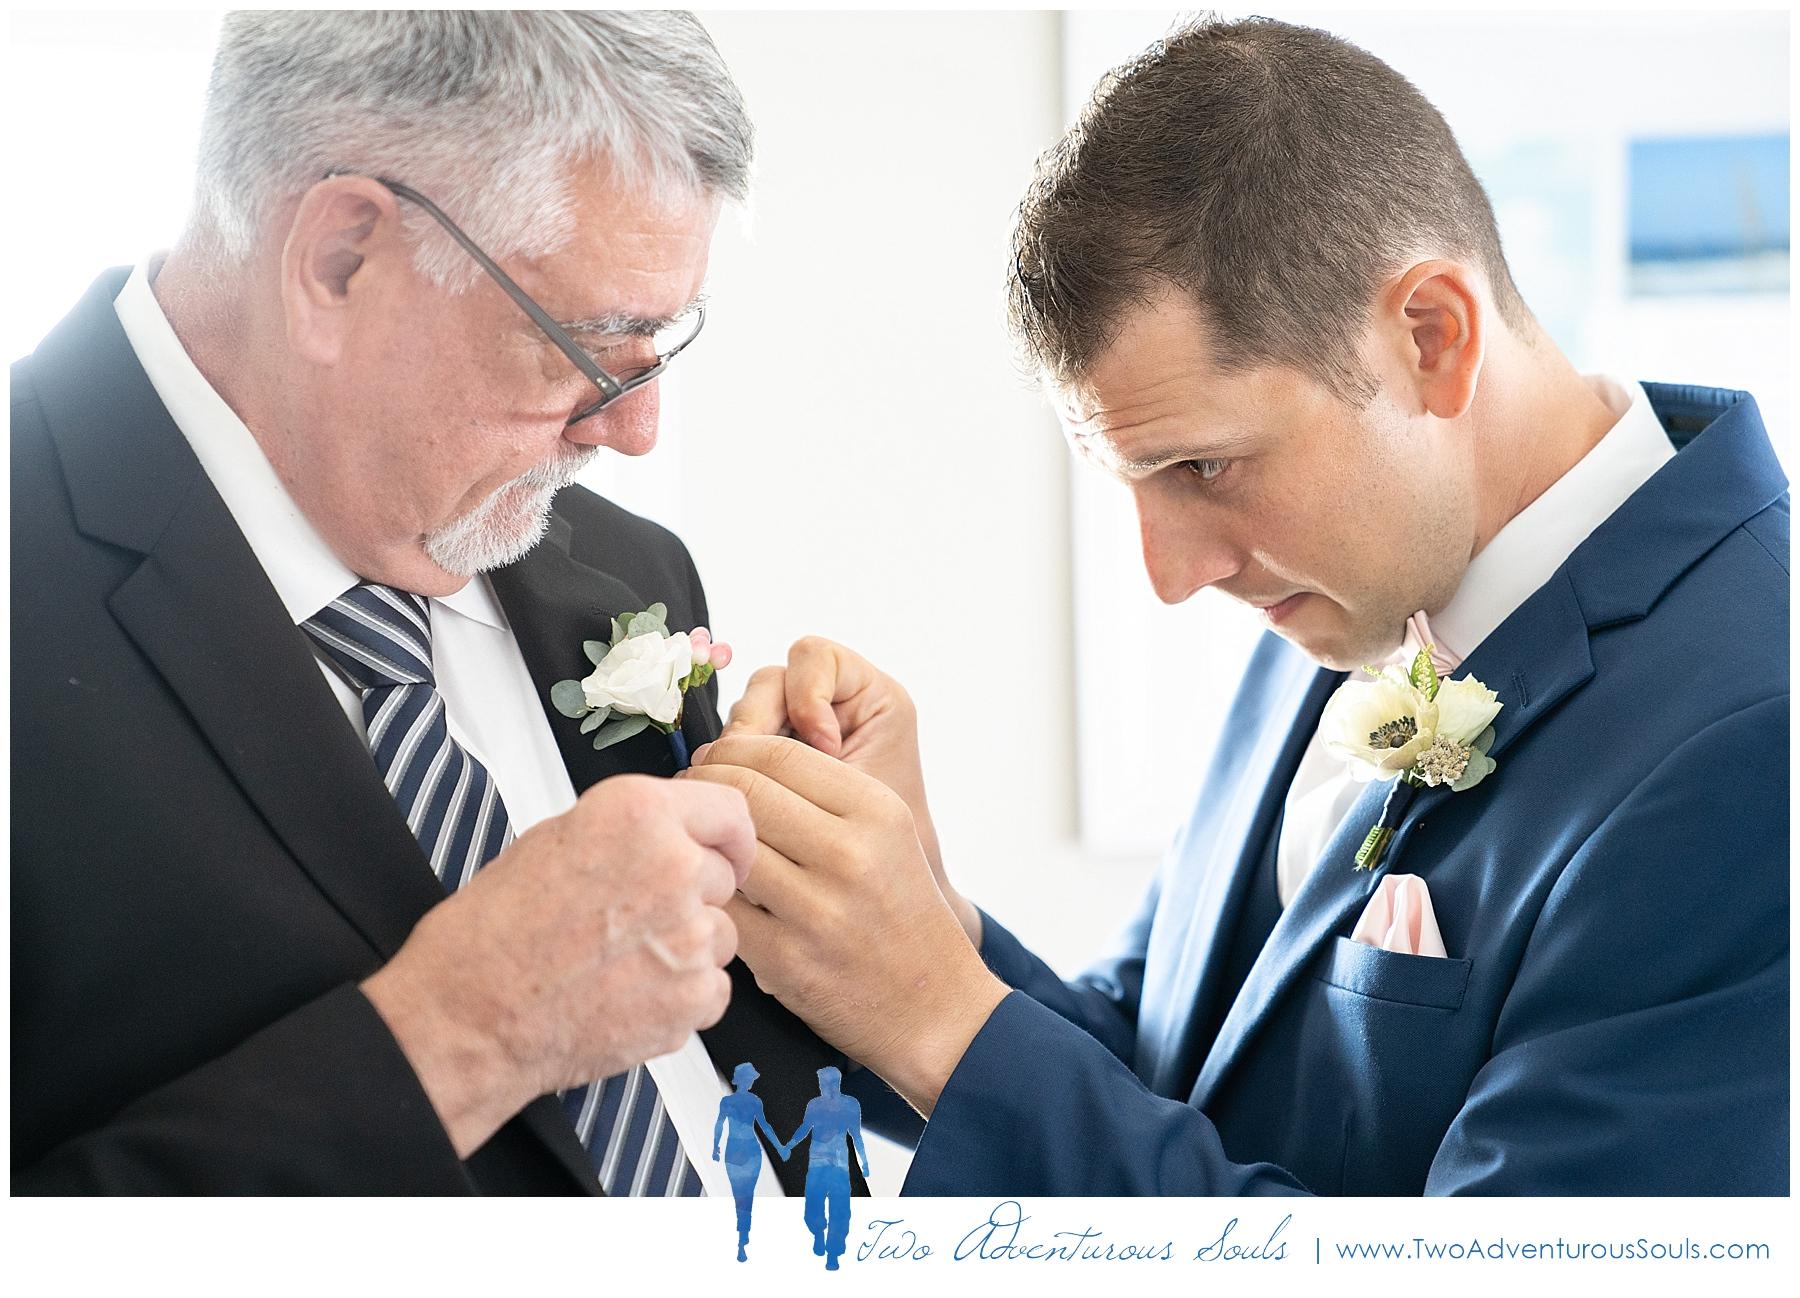 Connecticut Wedding Photographers, Lace Factory Wedding Photographers, Two Adventurous Souls - 083119_0012.jpg